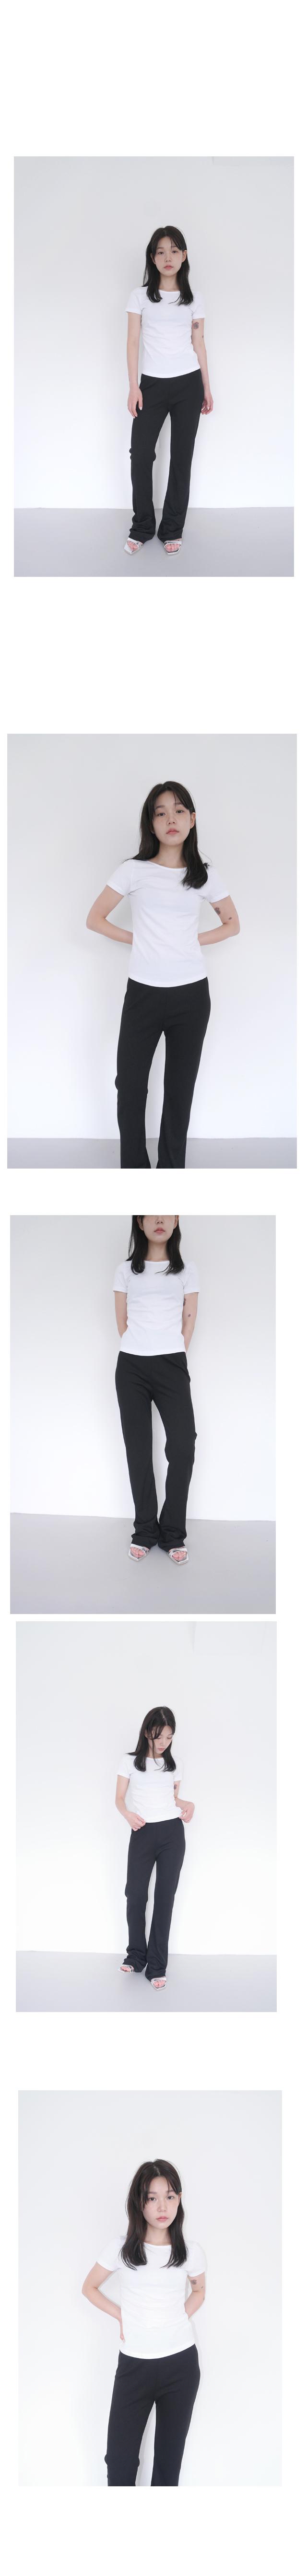 2 line simple middle heels